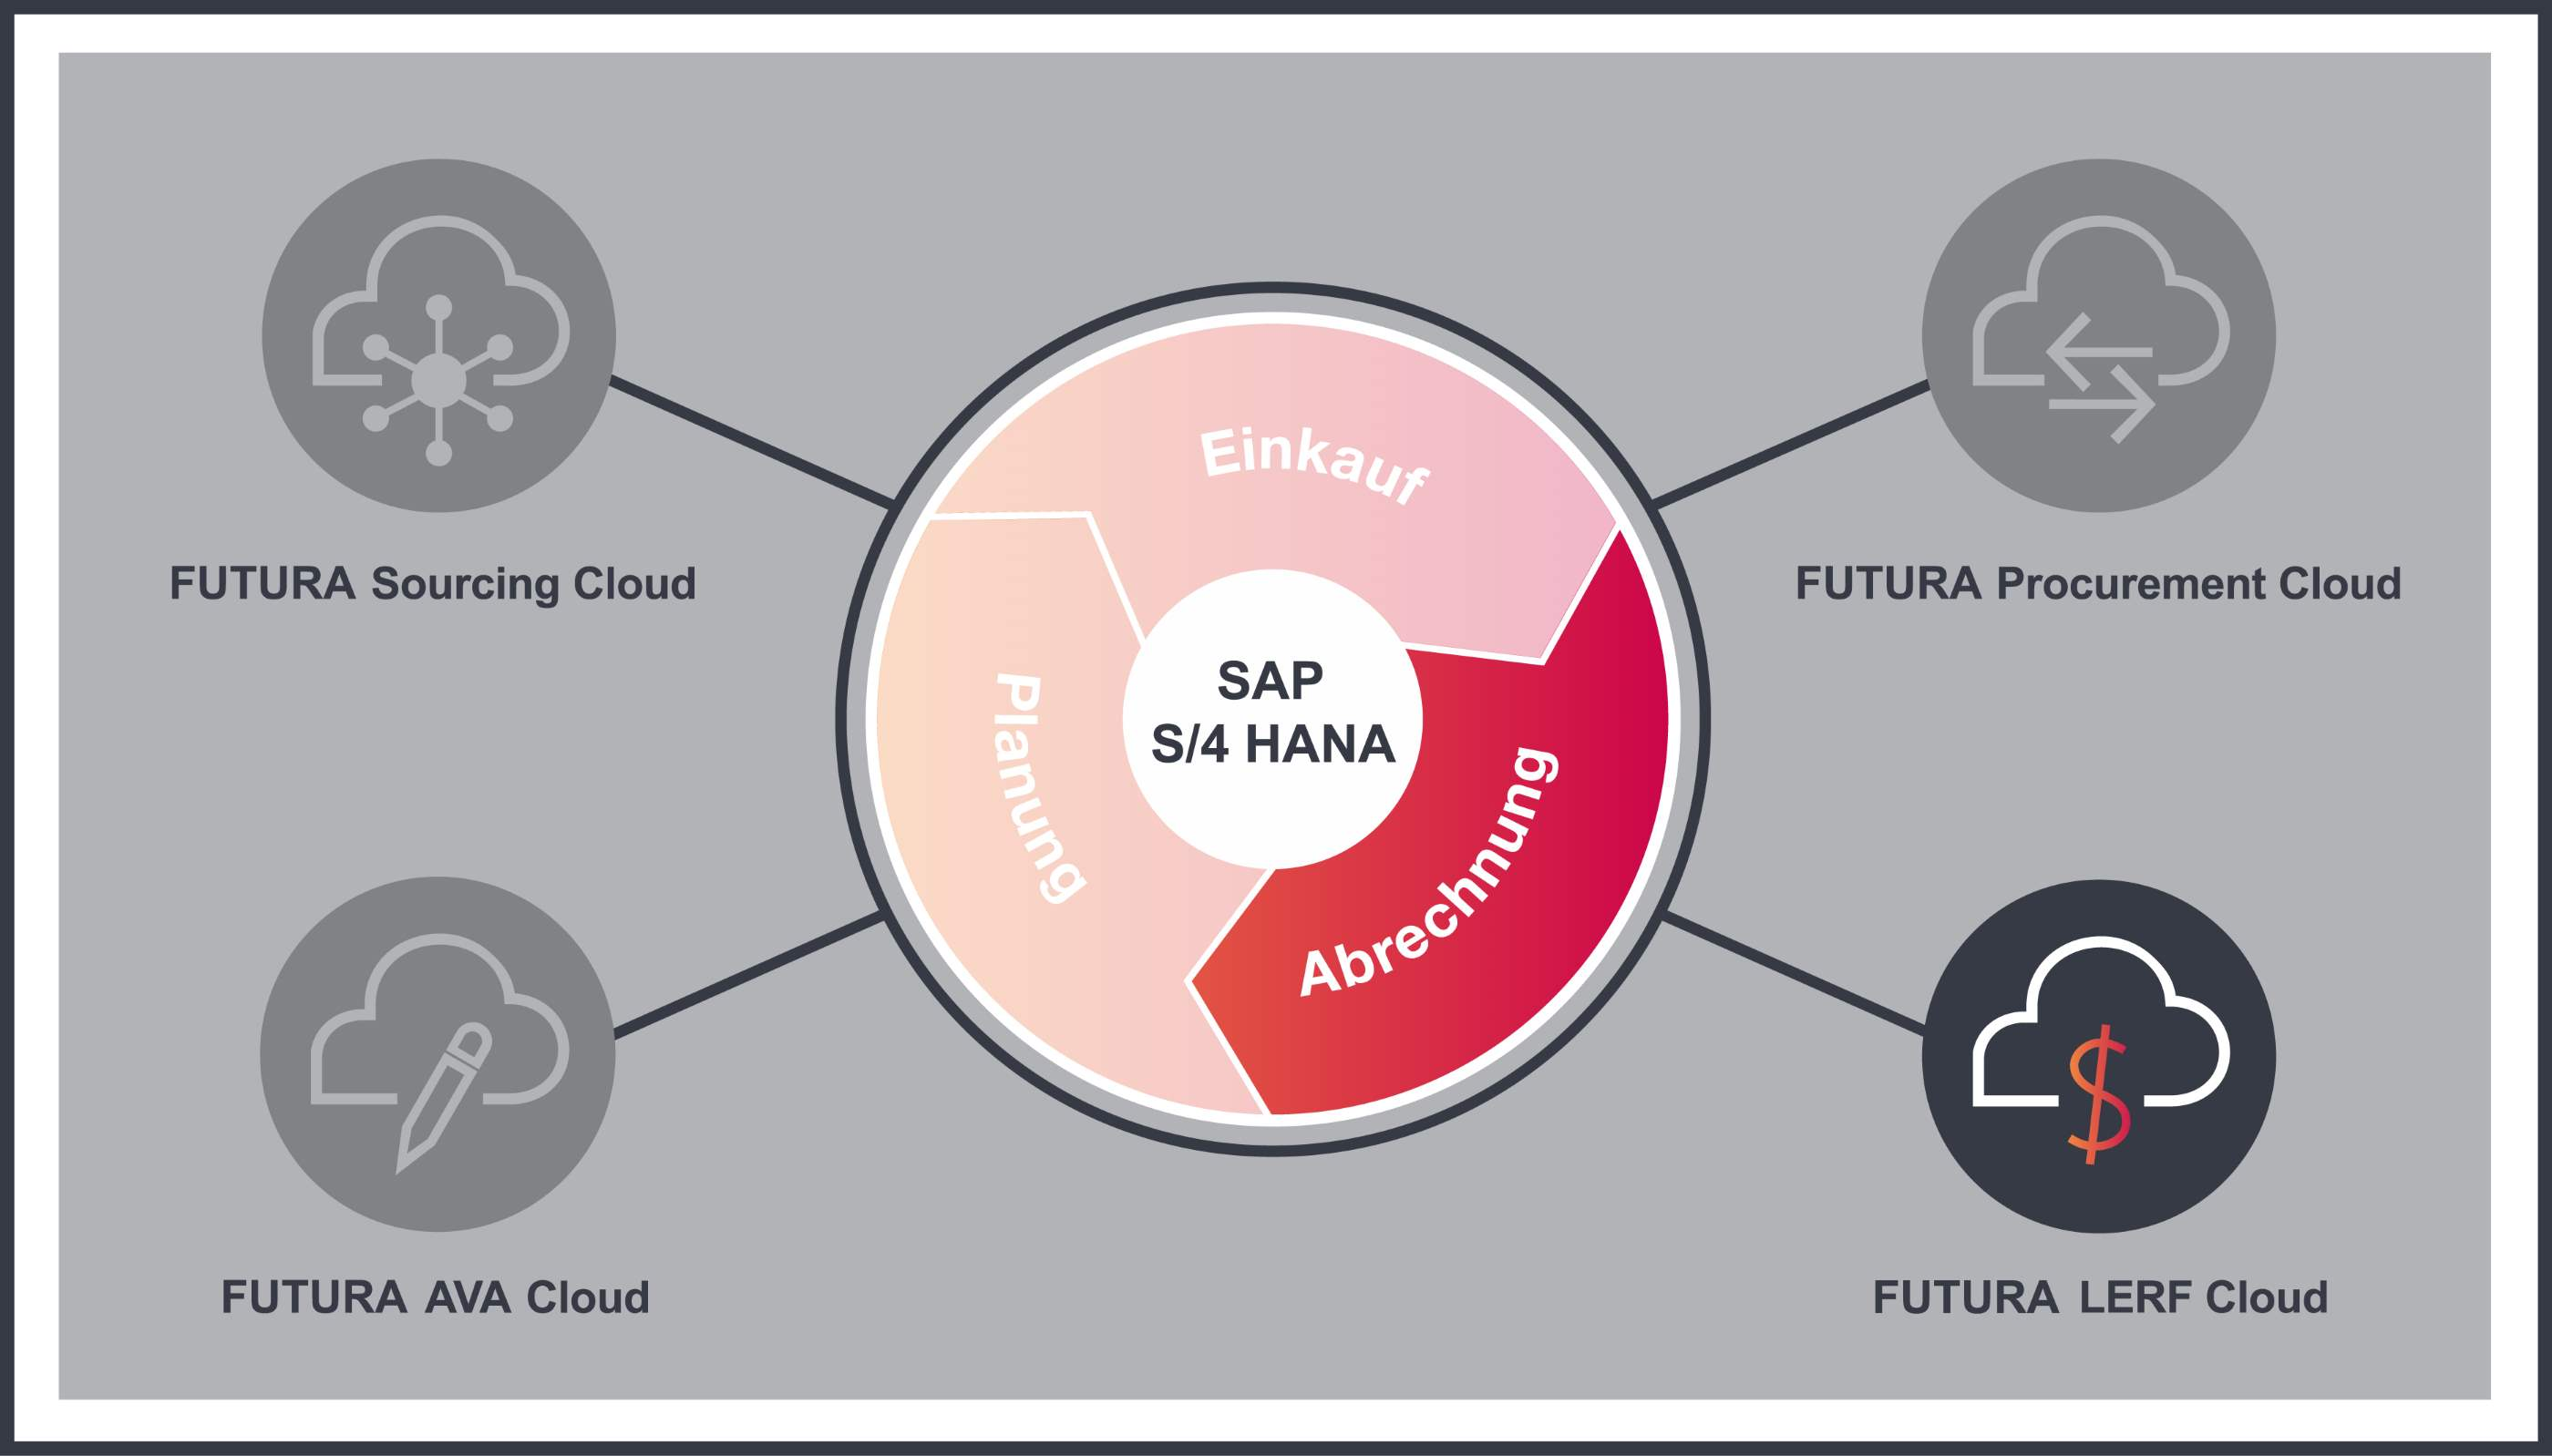 Kreislaufgrafik zur FUTURA LERF Cloud